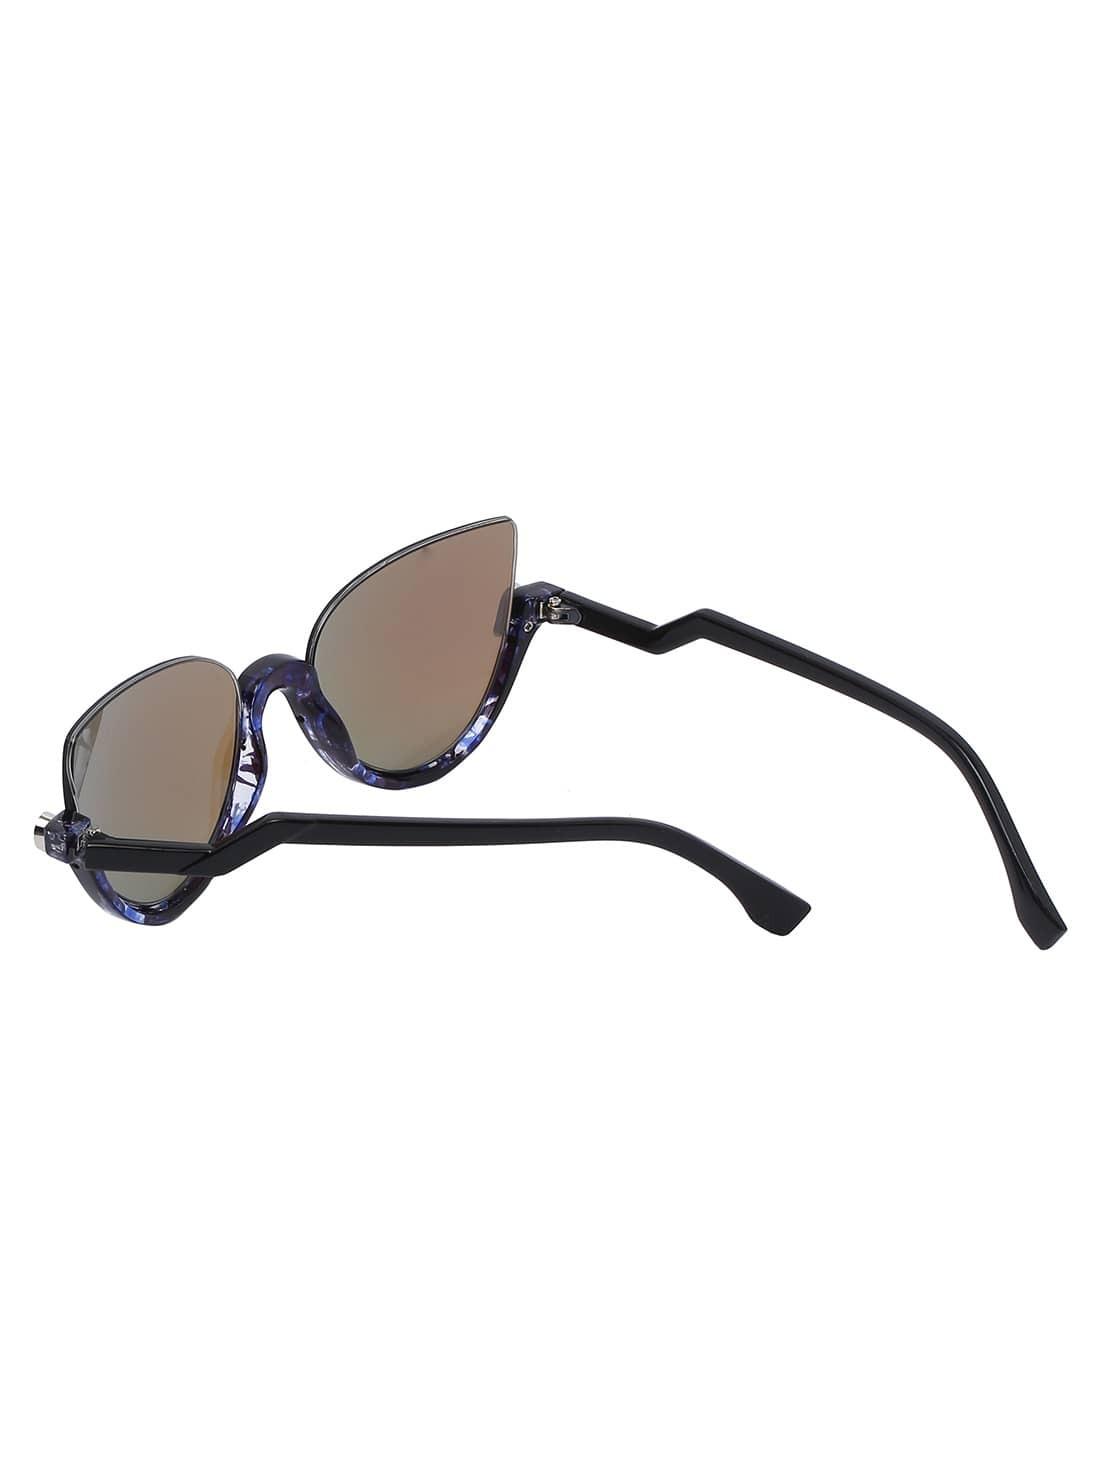 Cat Eye Blue Half Frame Sunglasses -SheIn(Sheinside)